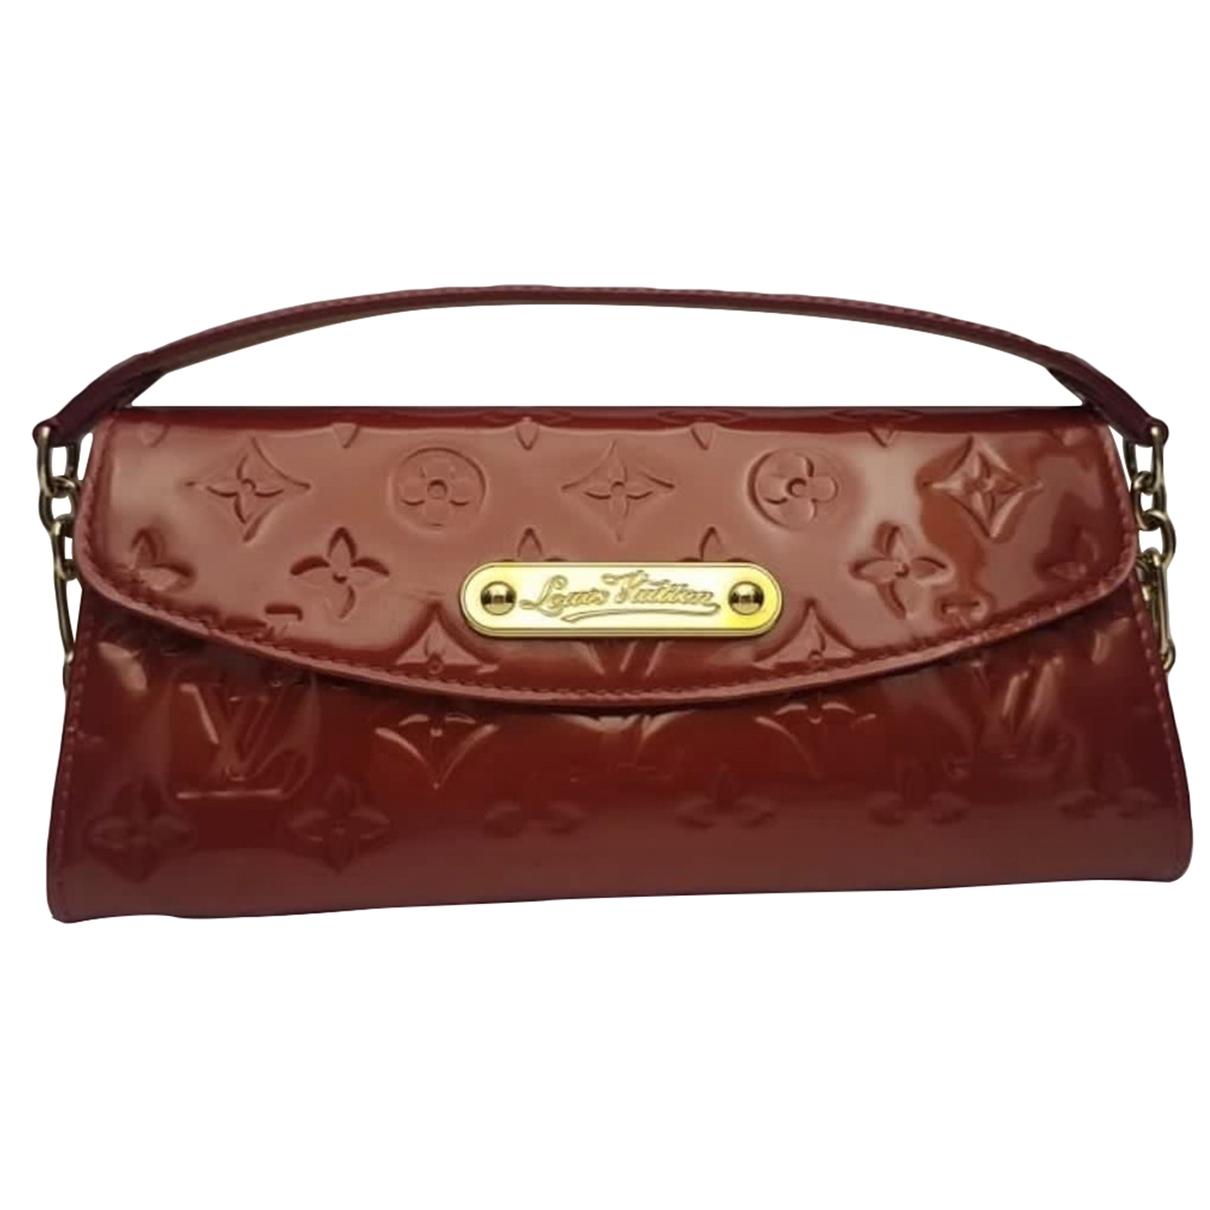 Louis Vuitton Sunset Boulevard Red Patent leather handbag for Women \N